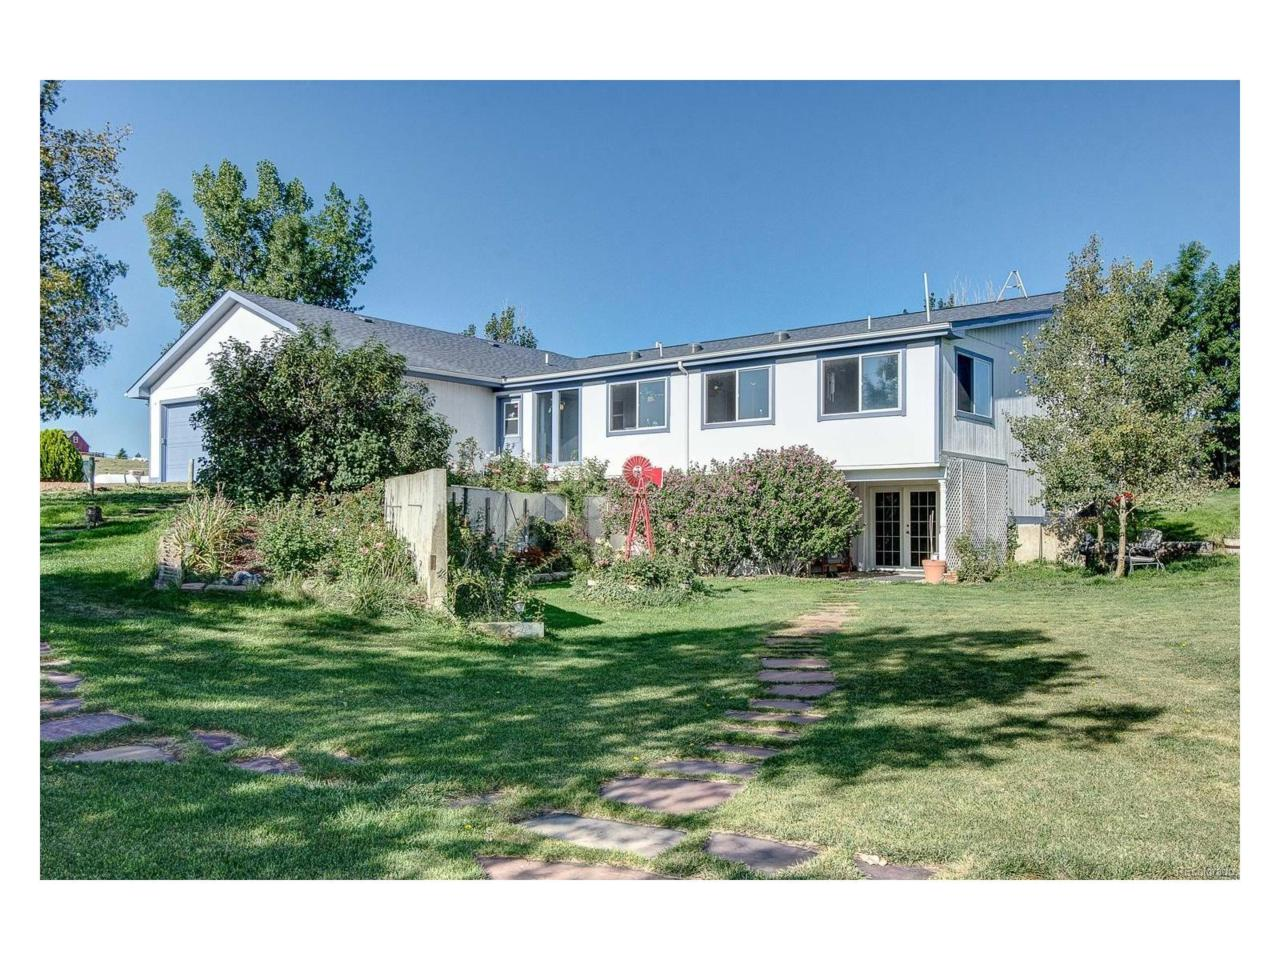 46761 Foxwood Drive, Elizabeth, CO 80107 (MLS #1514226) :: 8z Real Estate